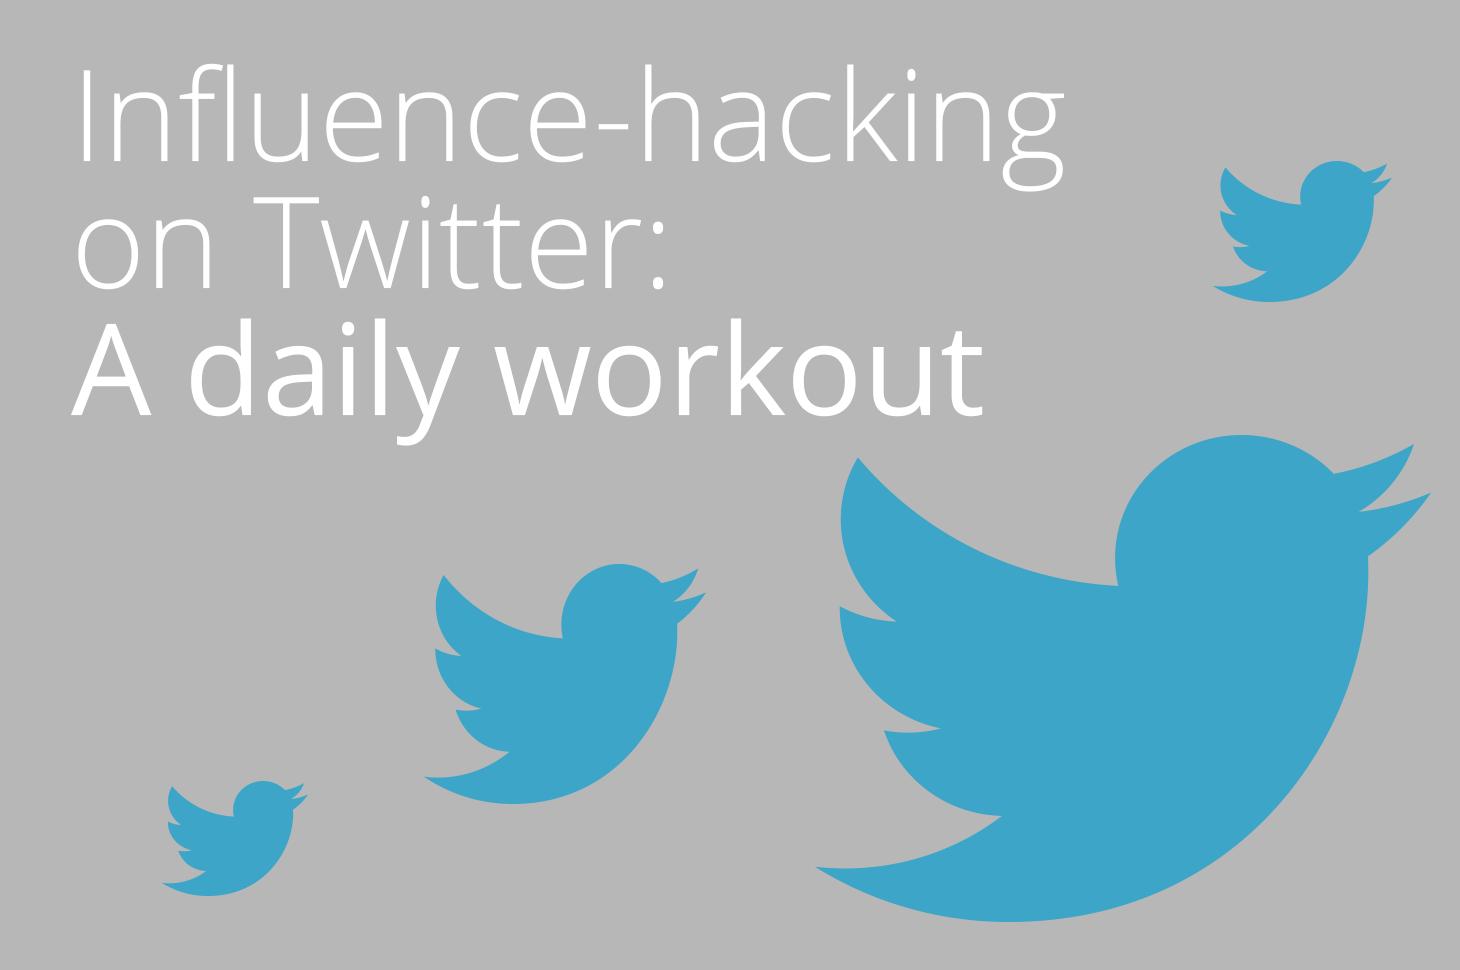 InfluenceHackingTwitter